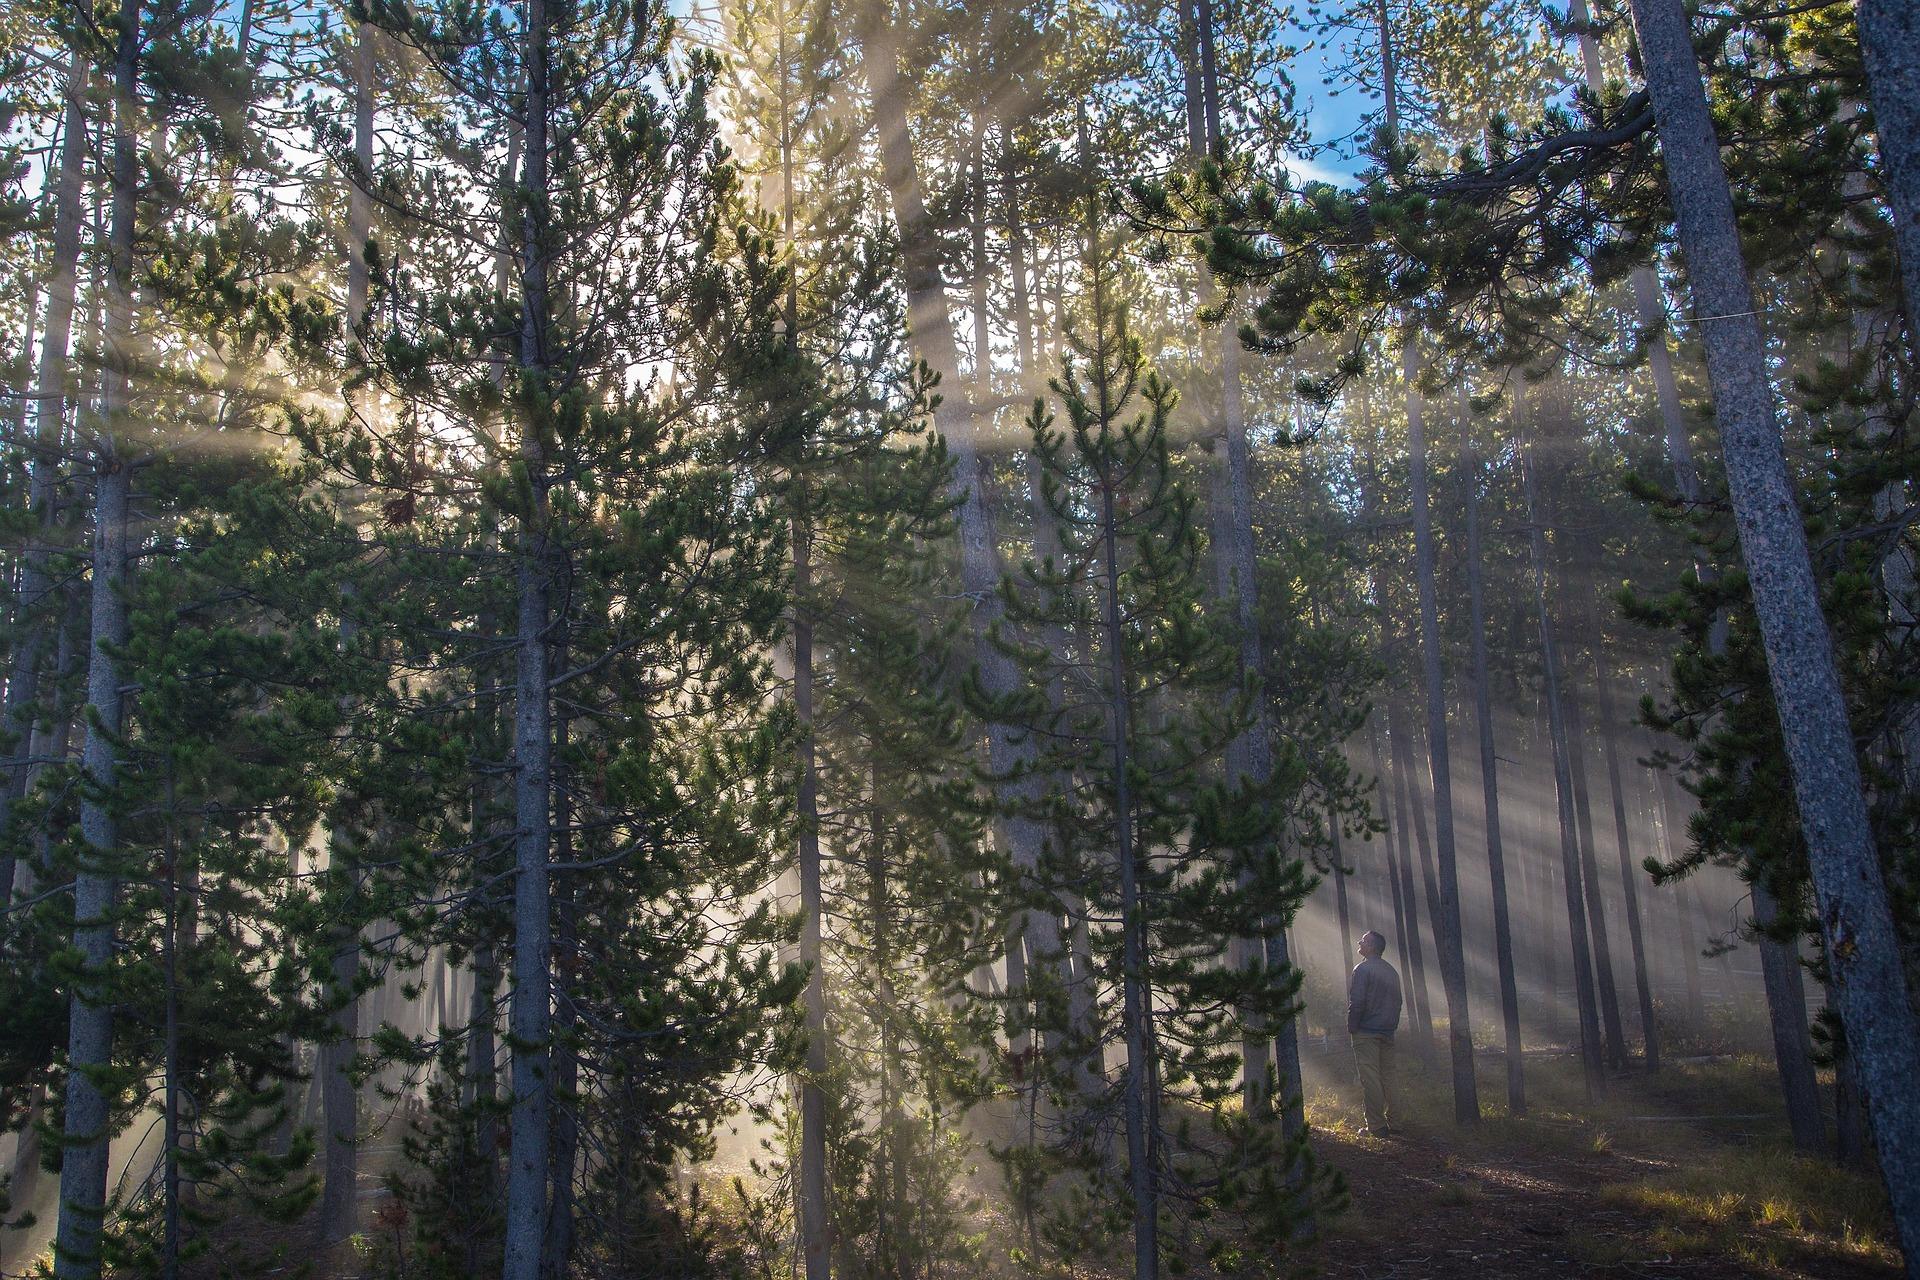 forest-1927500_1920.jpg